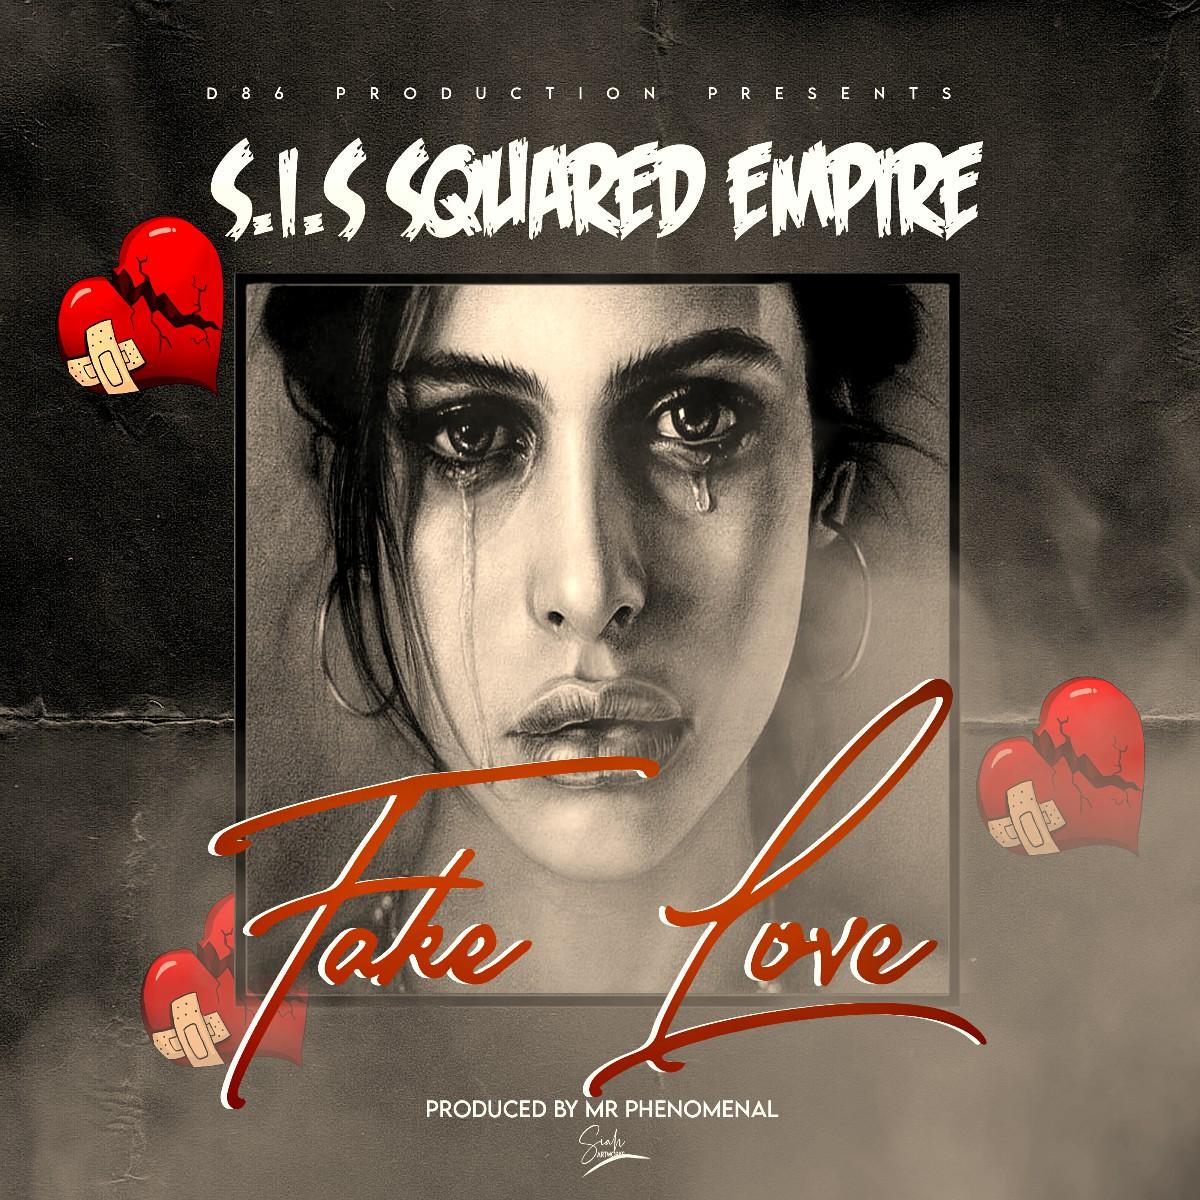 S.I.S Squared Empire - Fake Love